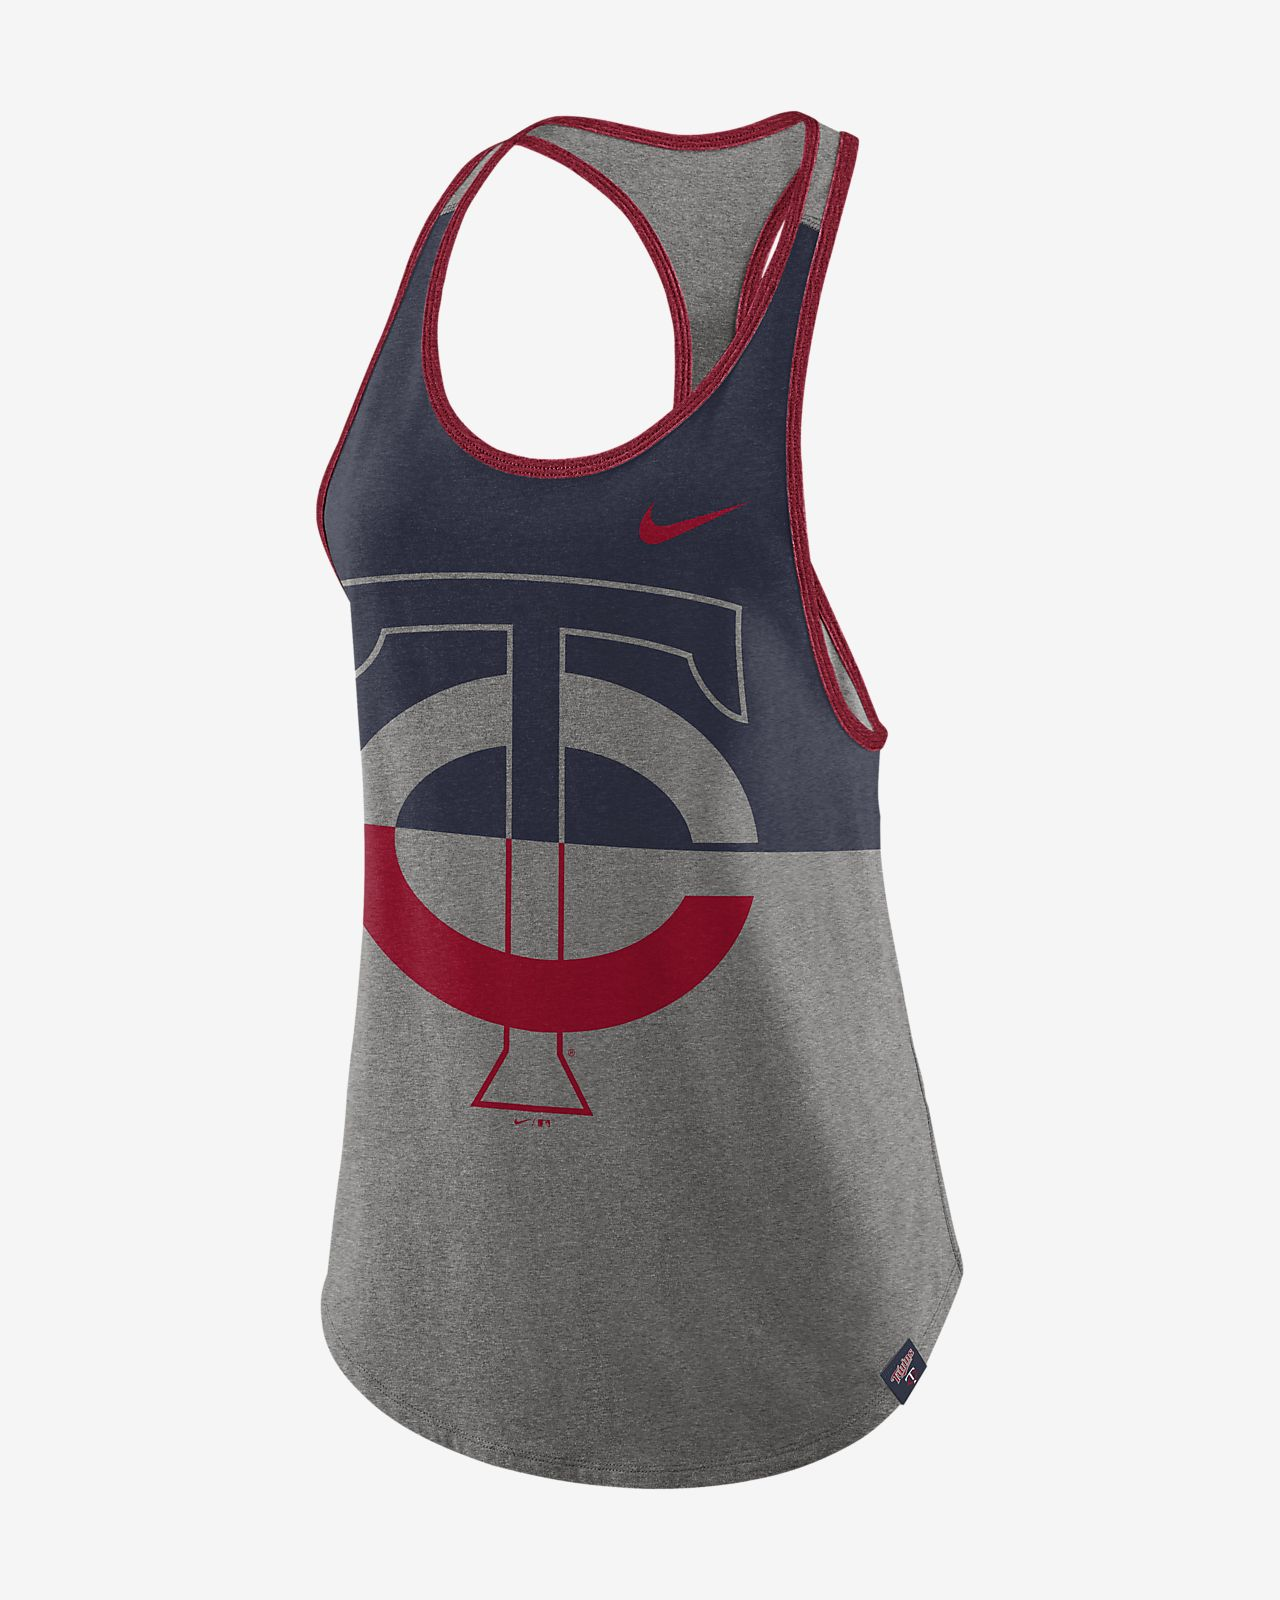 Nike Tri-Blend (MLB Twins) Women's Tank